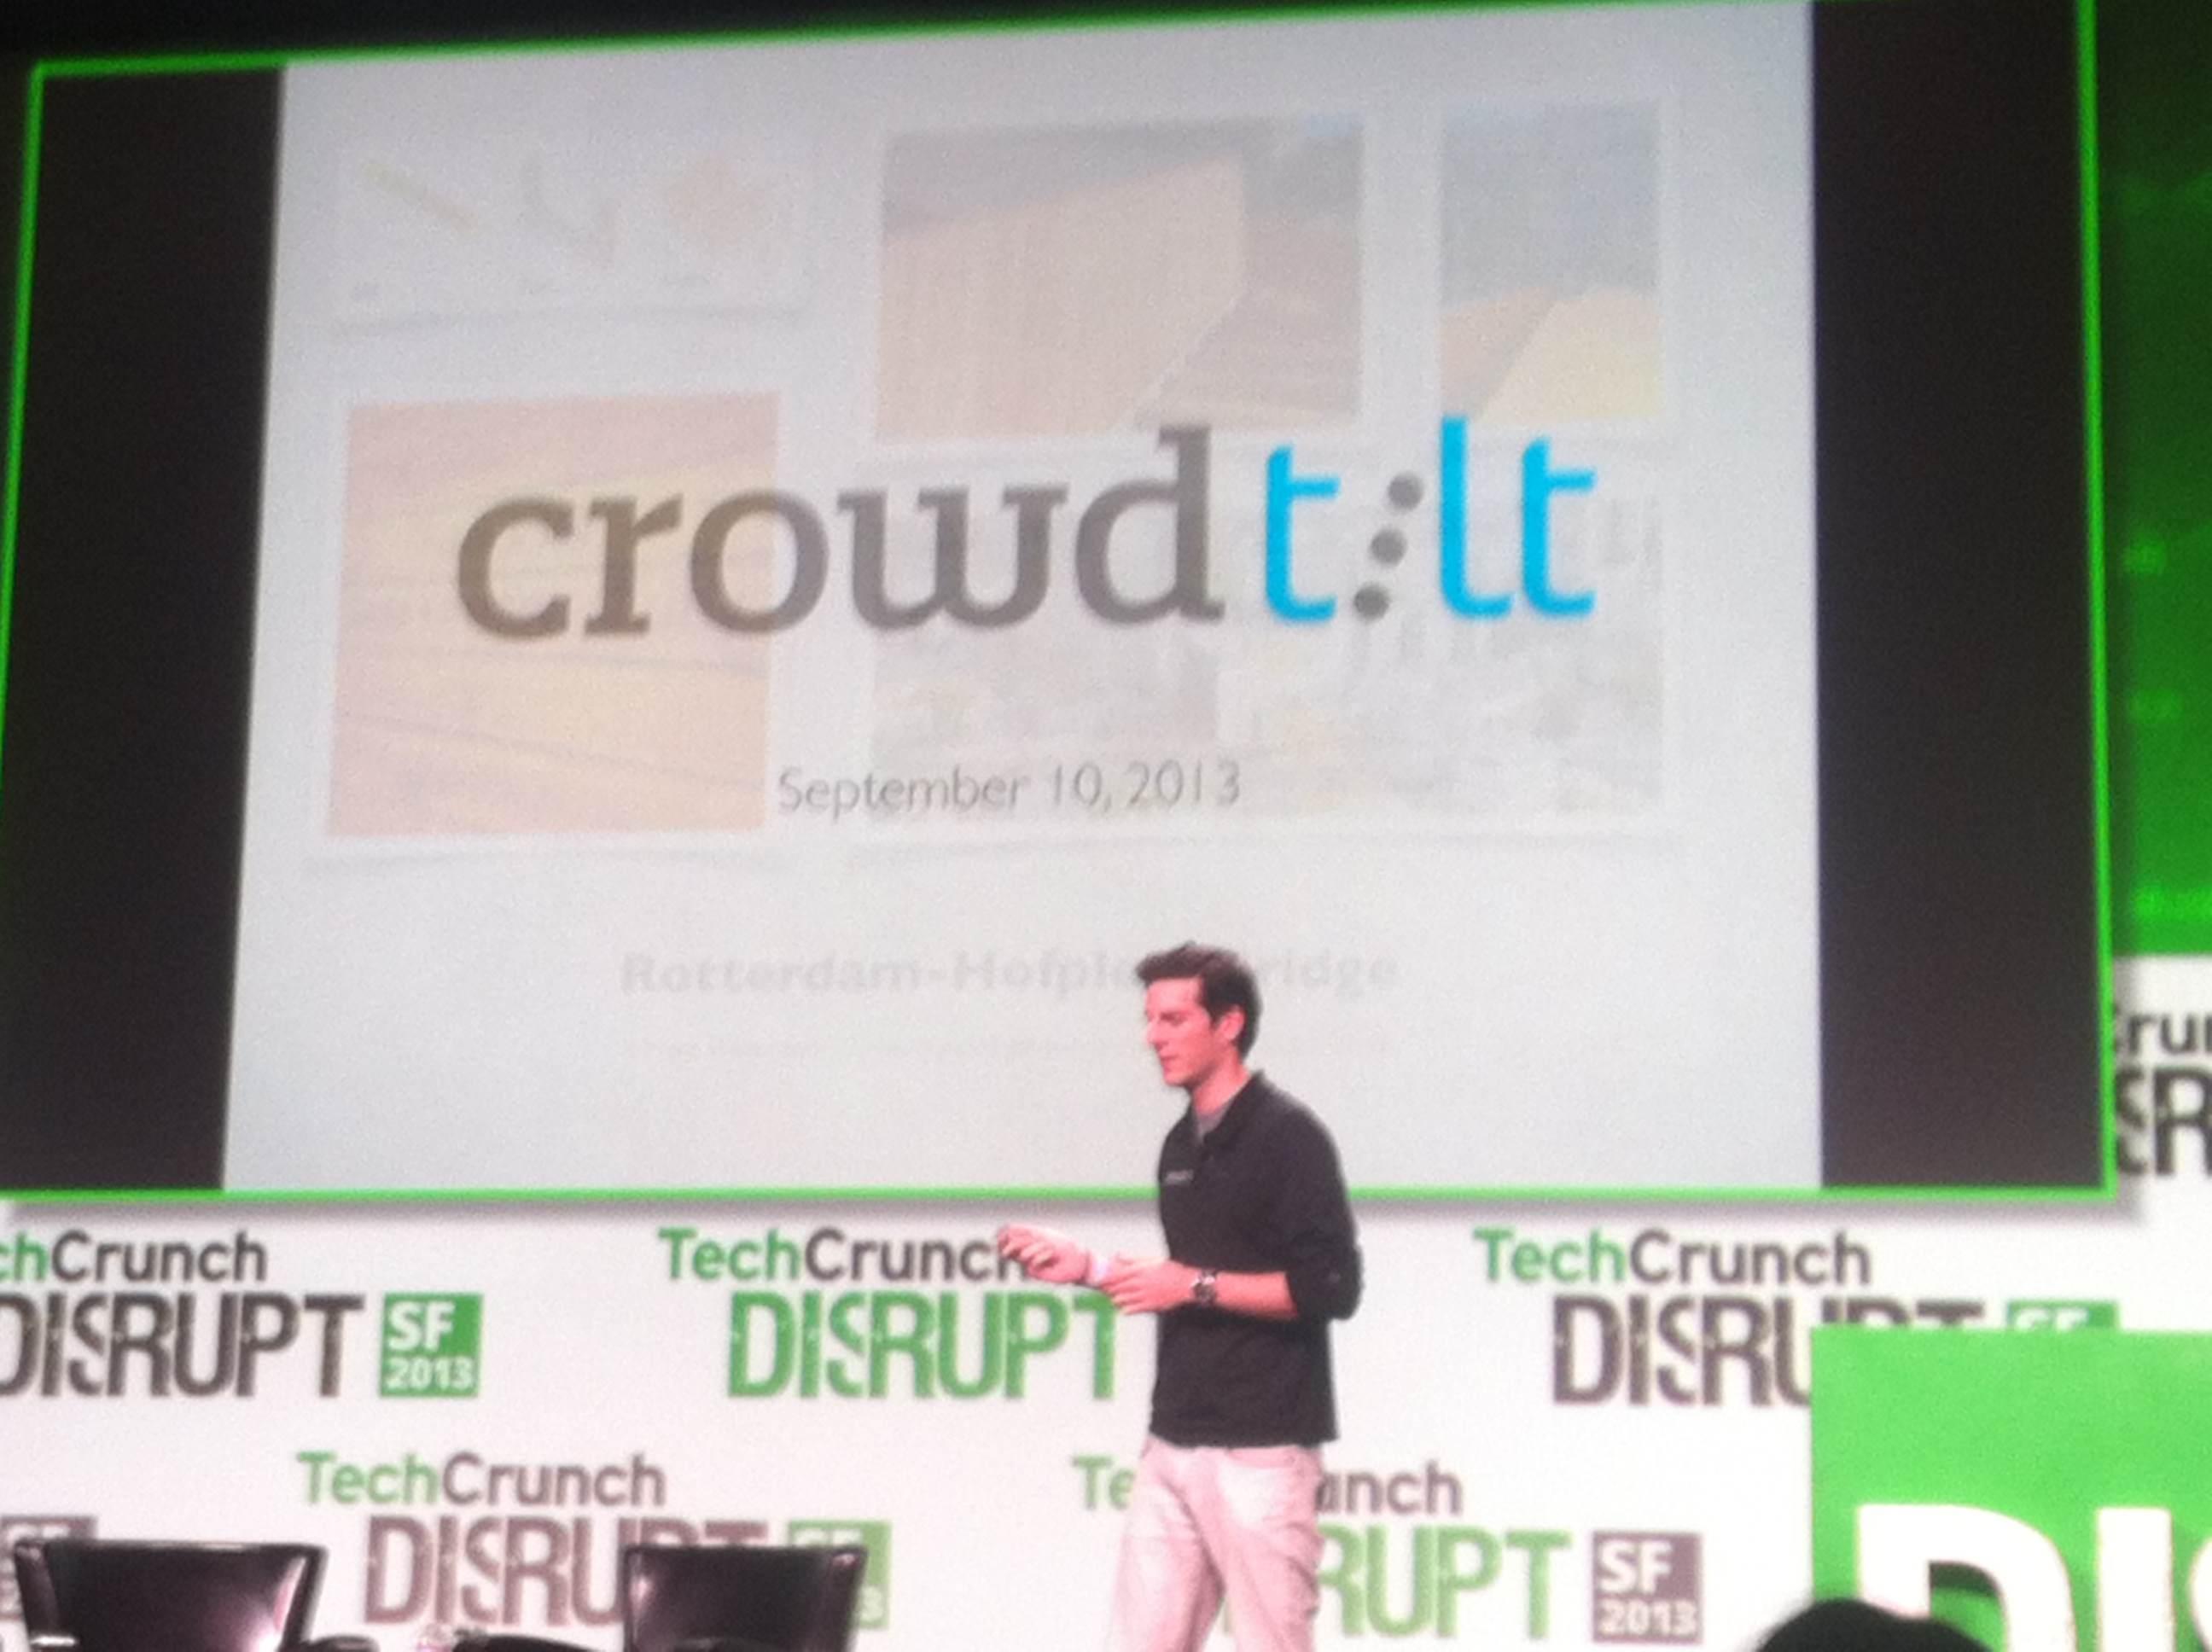 Crowdtilt CEO James Beshara onstage at TechCrunch Disrupt.